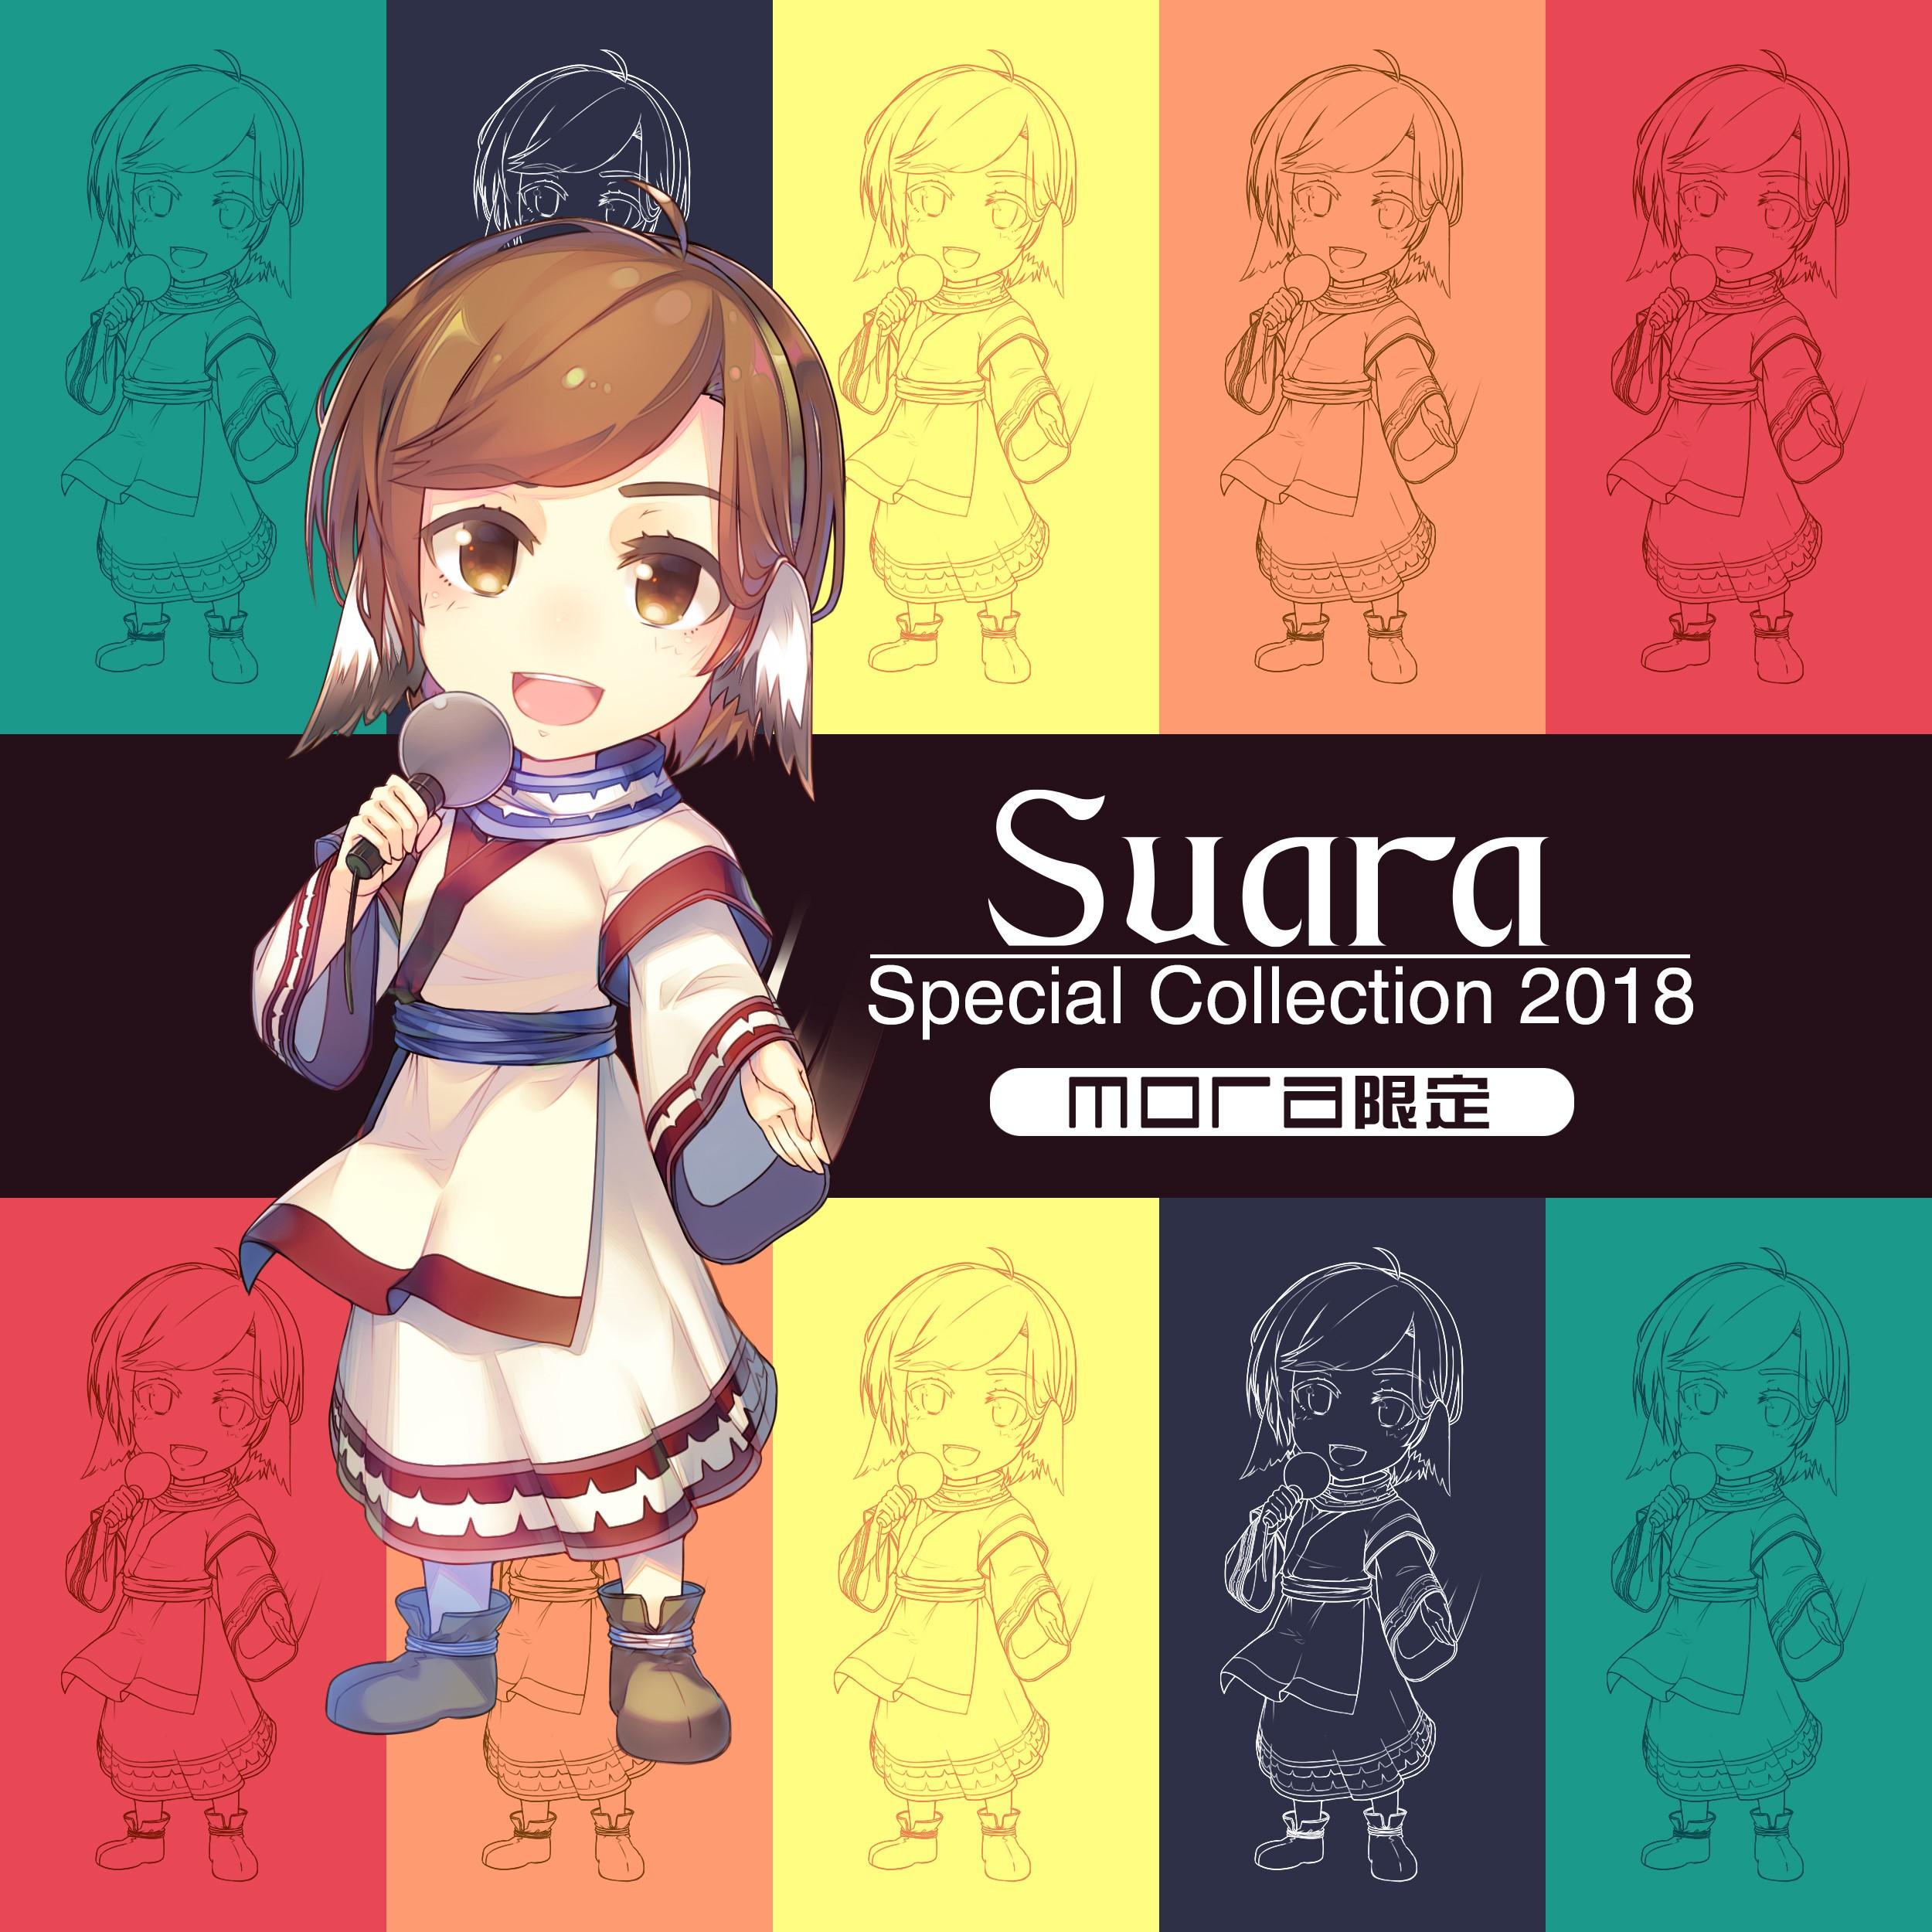 【mora限定】Suaraハイレゾコンピ、期間限定スペシャル価格で配信スタート!【2018/08/01~2018/08/31】